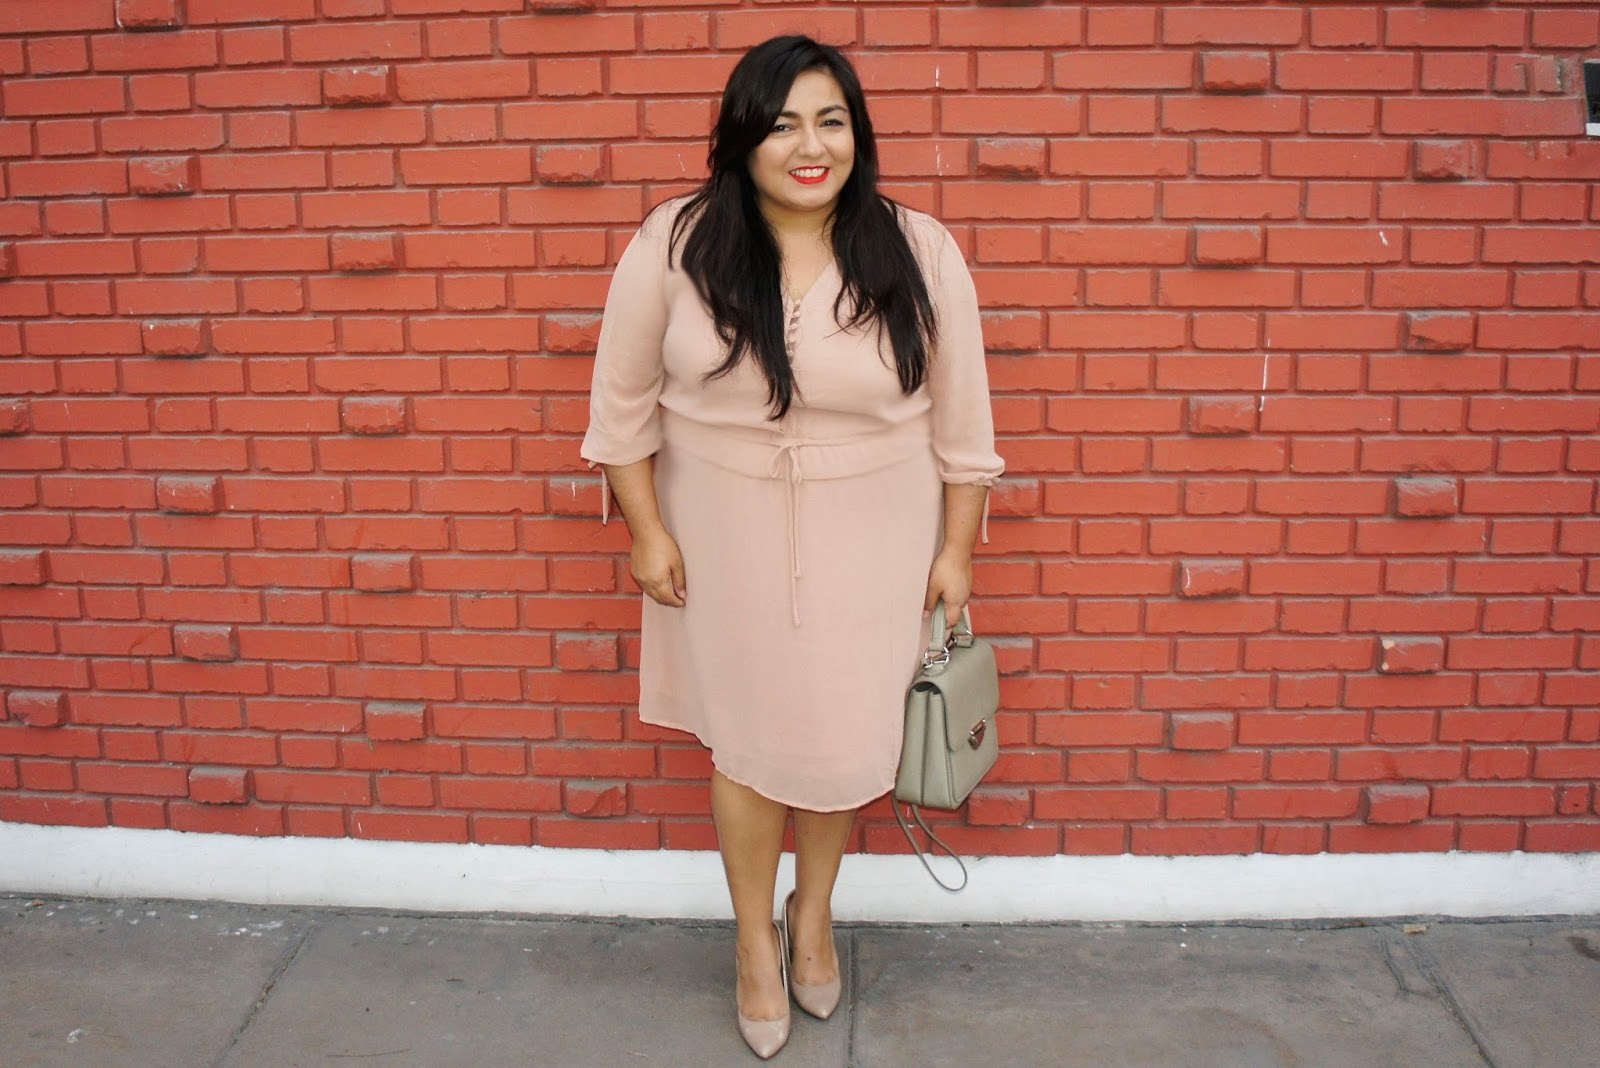 pink dress legalmente en taco 12